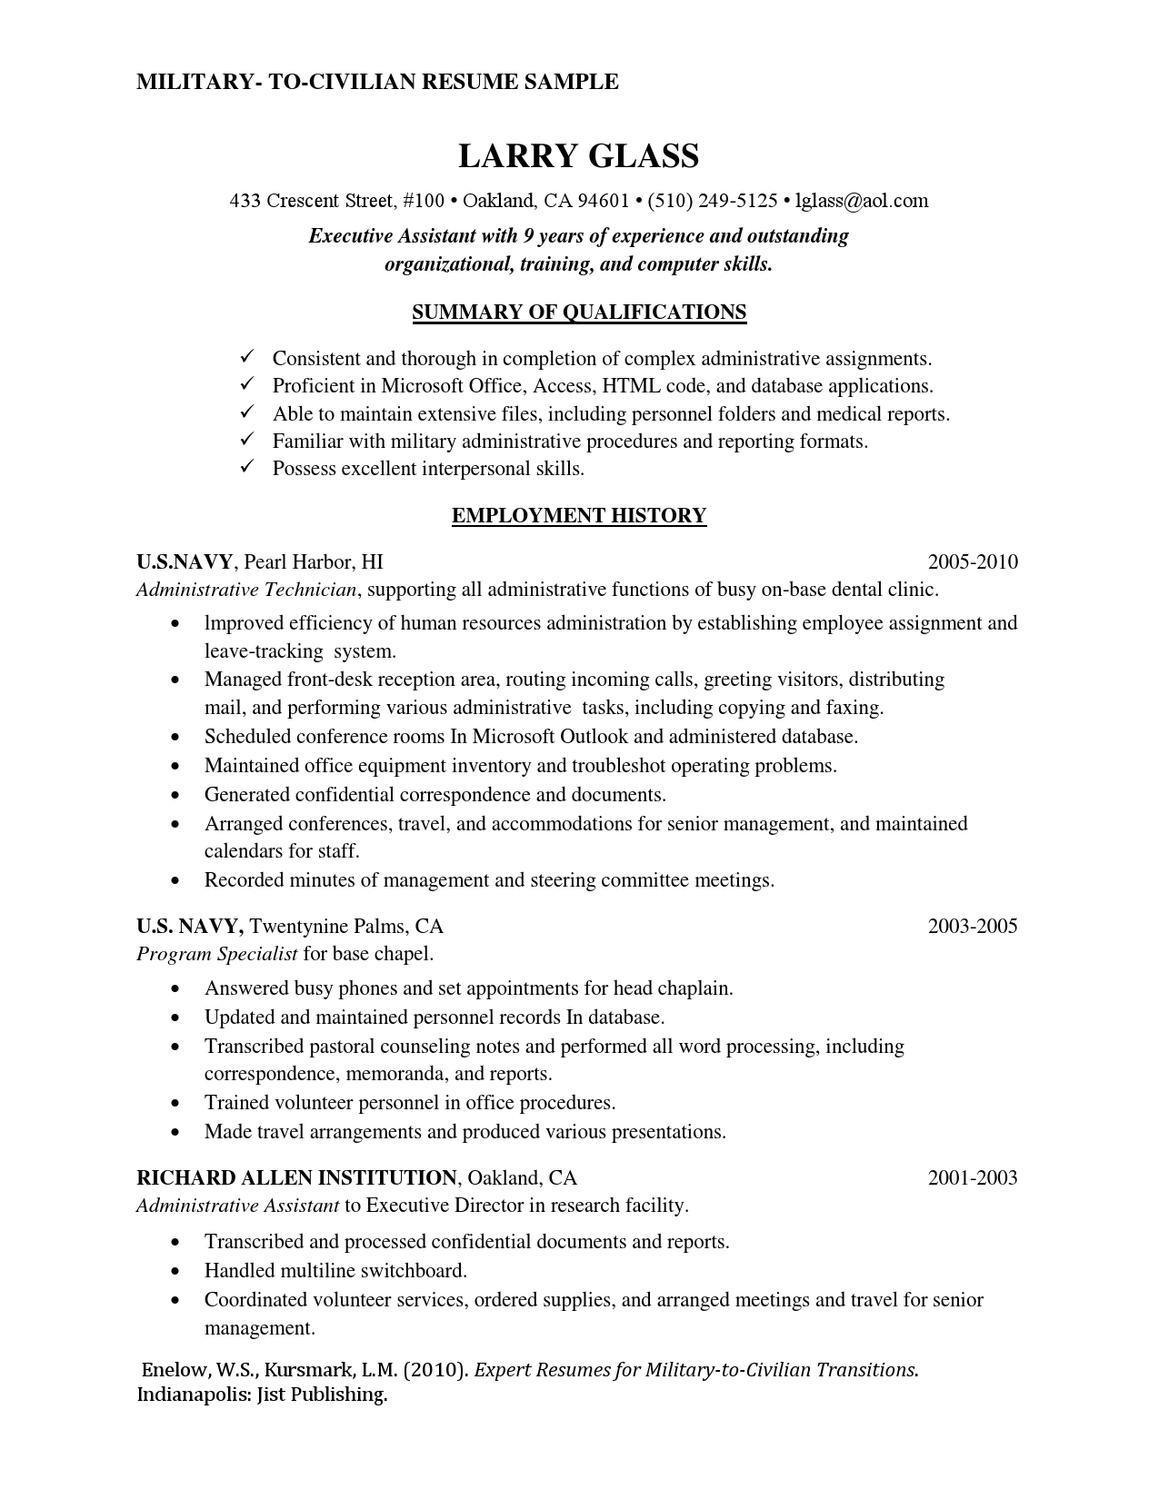 Sample Military to Civilian Transition Resume Military to Civilian Resume Sample by Rosaria Pipitone – issuu